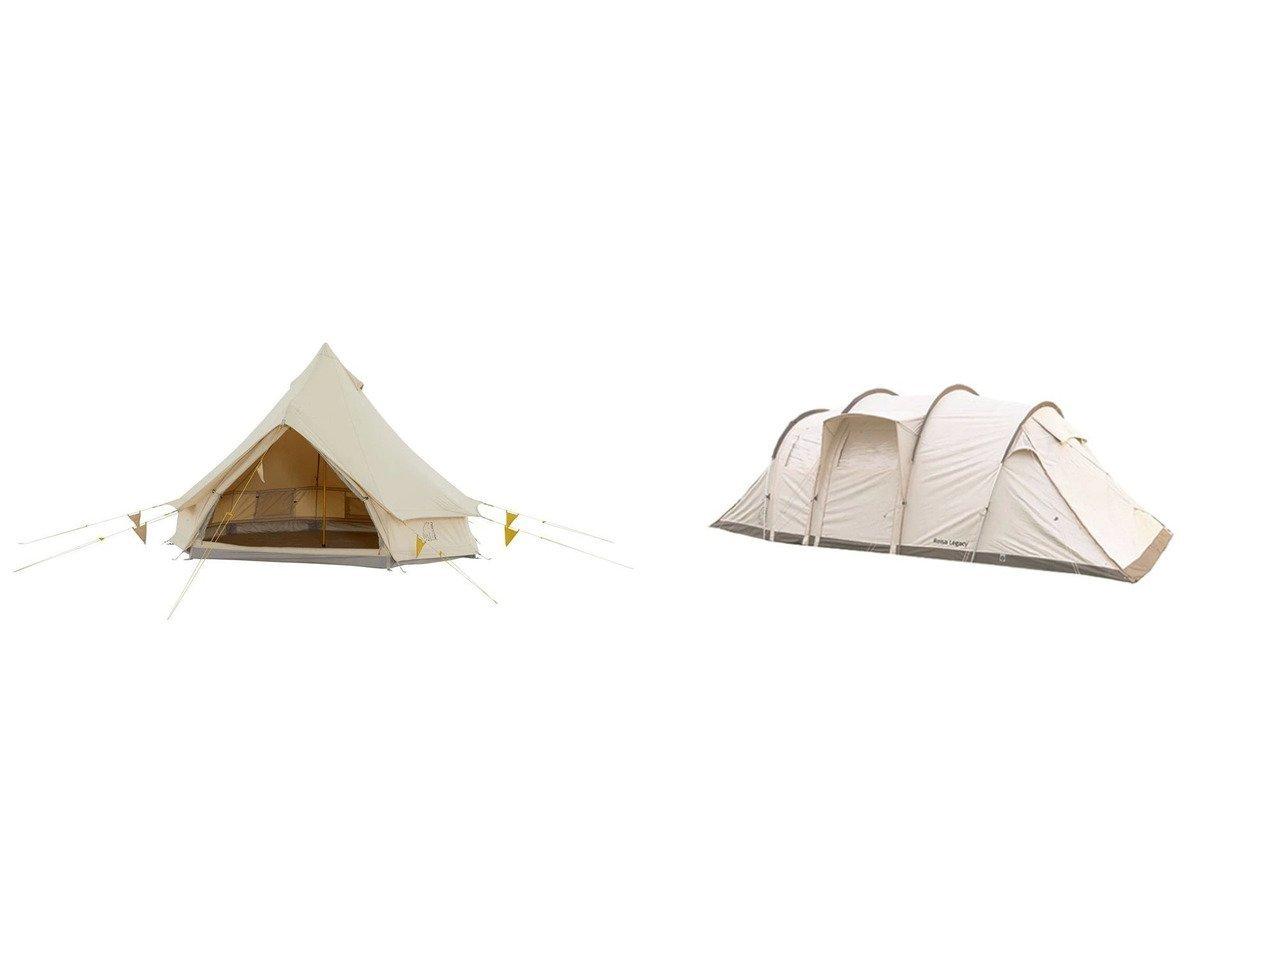 【Nordisk/ノルディスク】のファミリーテント ドーム Asgard Tech Mini 148055&ファミリーテント 2ルーム レイサ6 レガシー 142025 おすすめ!人気キャンプ・アウトドア用品の通販 おすすめで人気の流行・トレンド、ファッションの通販商品 メンズファッション・キッズファッション・インテリア・家具・レディースファッション・服の通販 founy(ファニー) https://founy.com/ 軽量 インナー センター ホーム・キャンプ・アウトドア Home,Garden,Outdoor,Camping Gear キャンプ用品・アウトドア  Camping Gear & Outdoor Supplies テント タープ Tents, Tarp |ID:crp329100000037422